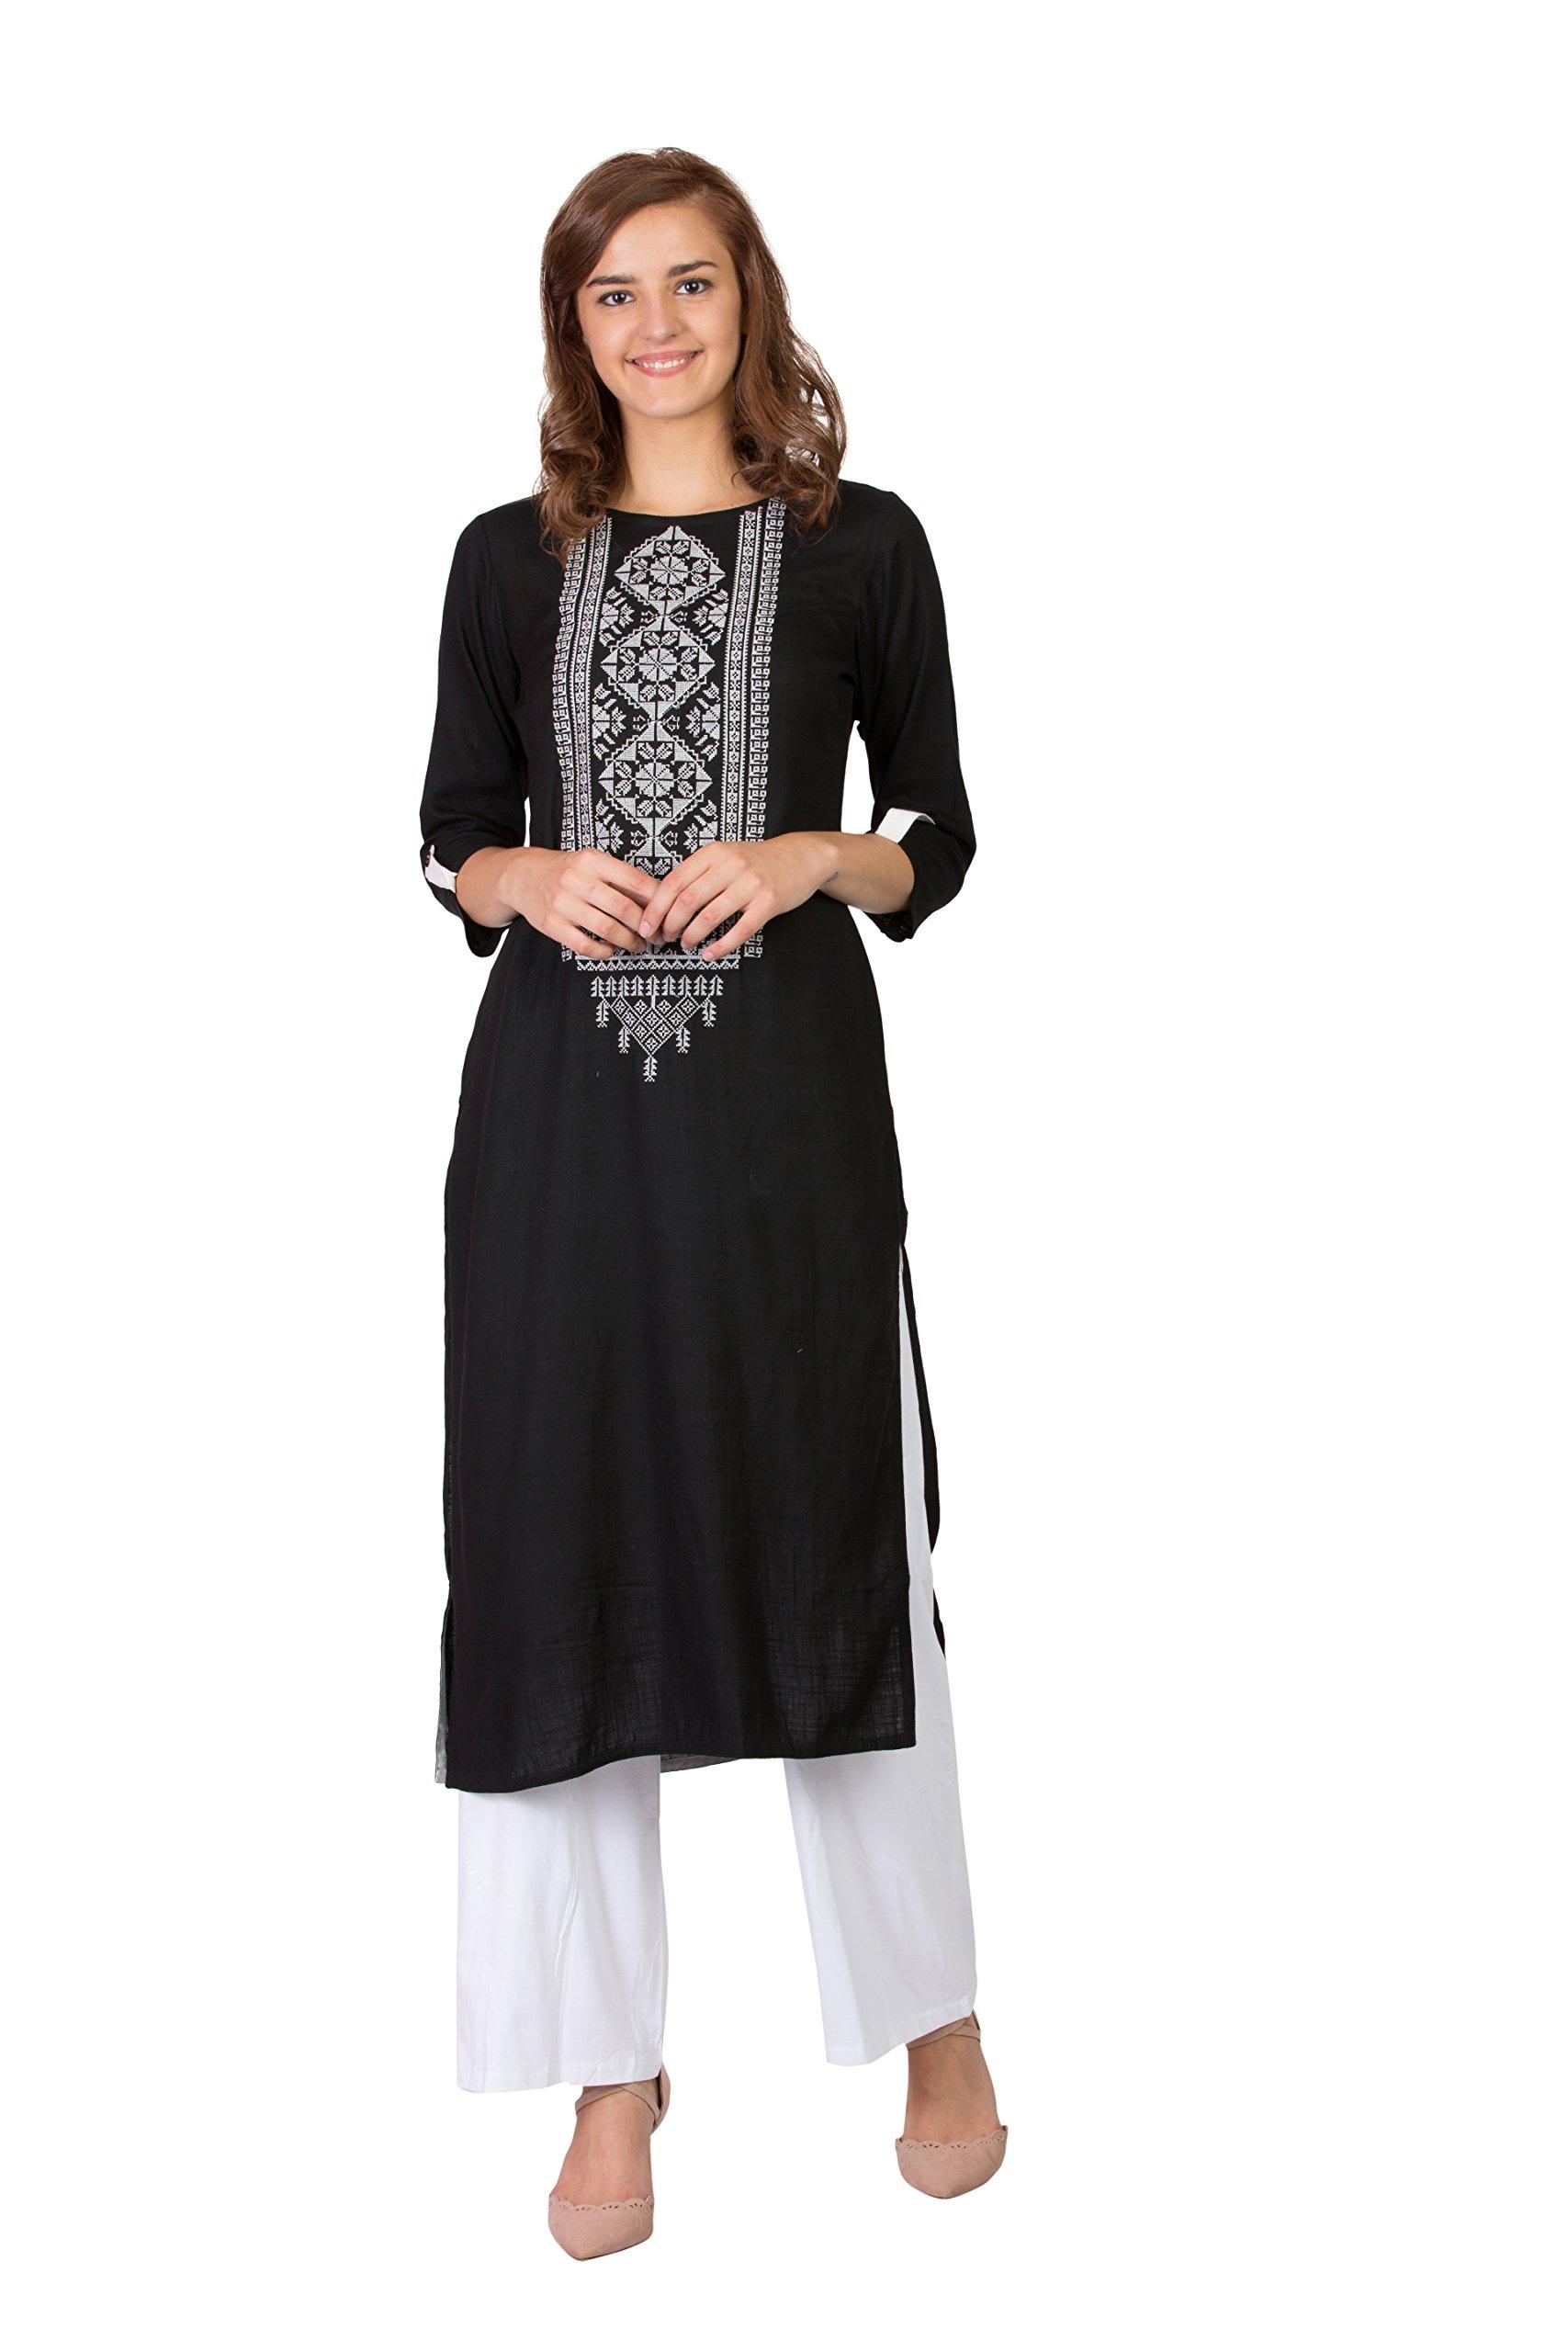 SABHYATA Women's Kurta 100% Pure Cotton Kurti for Women Tunic Casual Long Multicoloured Dress (Small, Black (182rc1-xl)